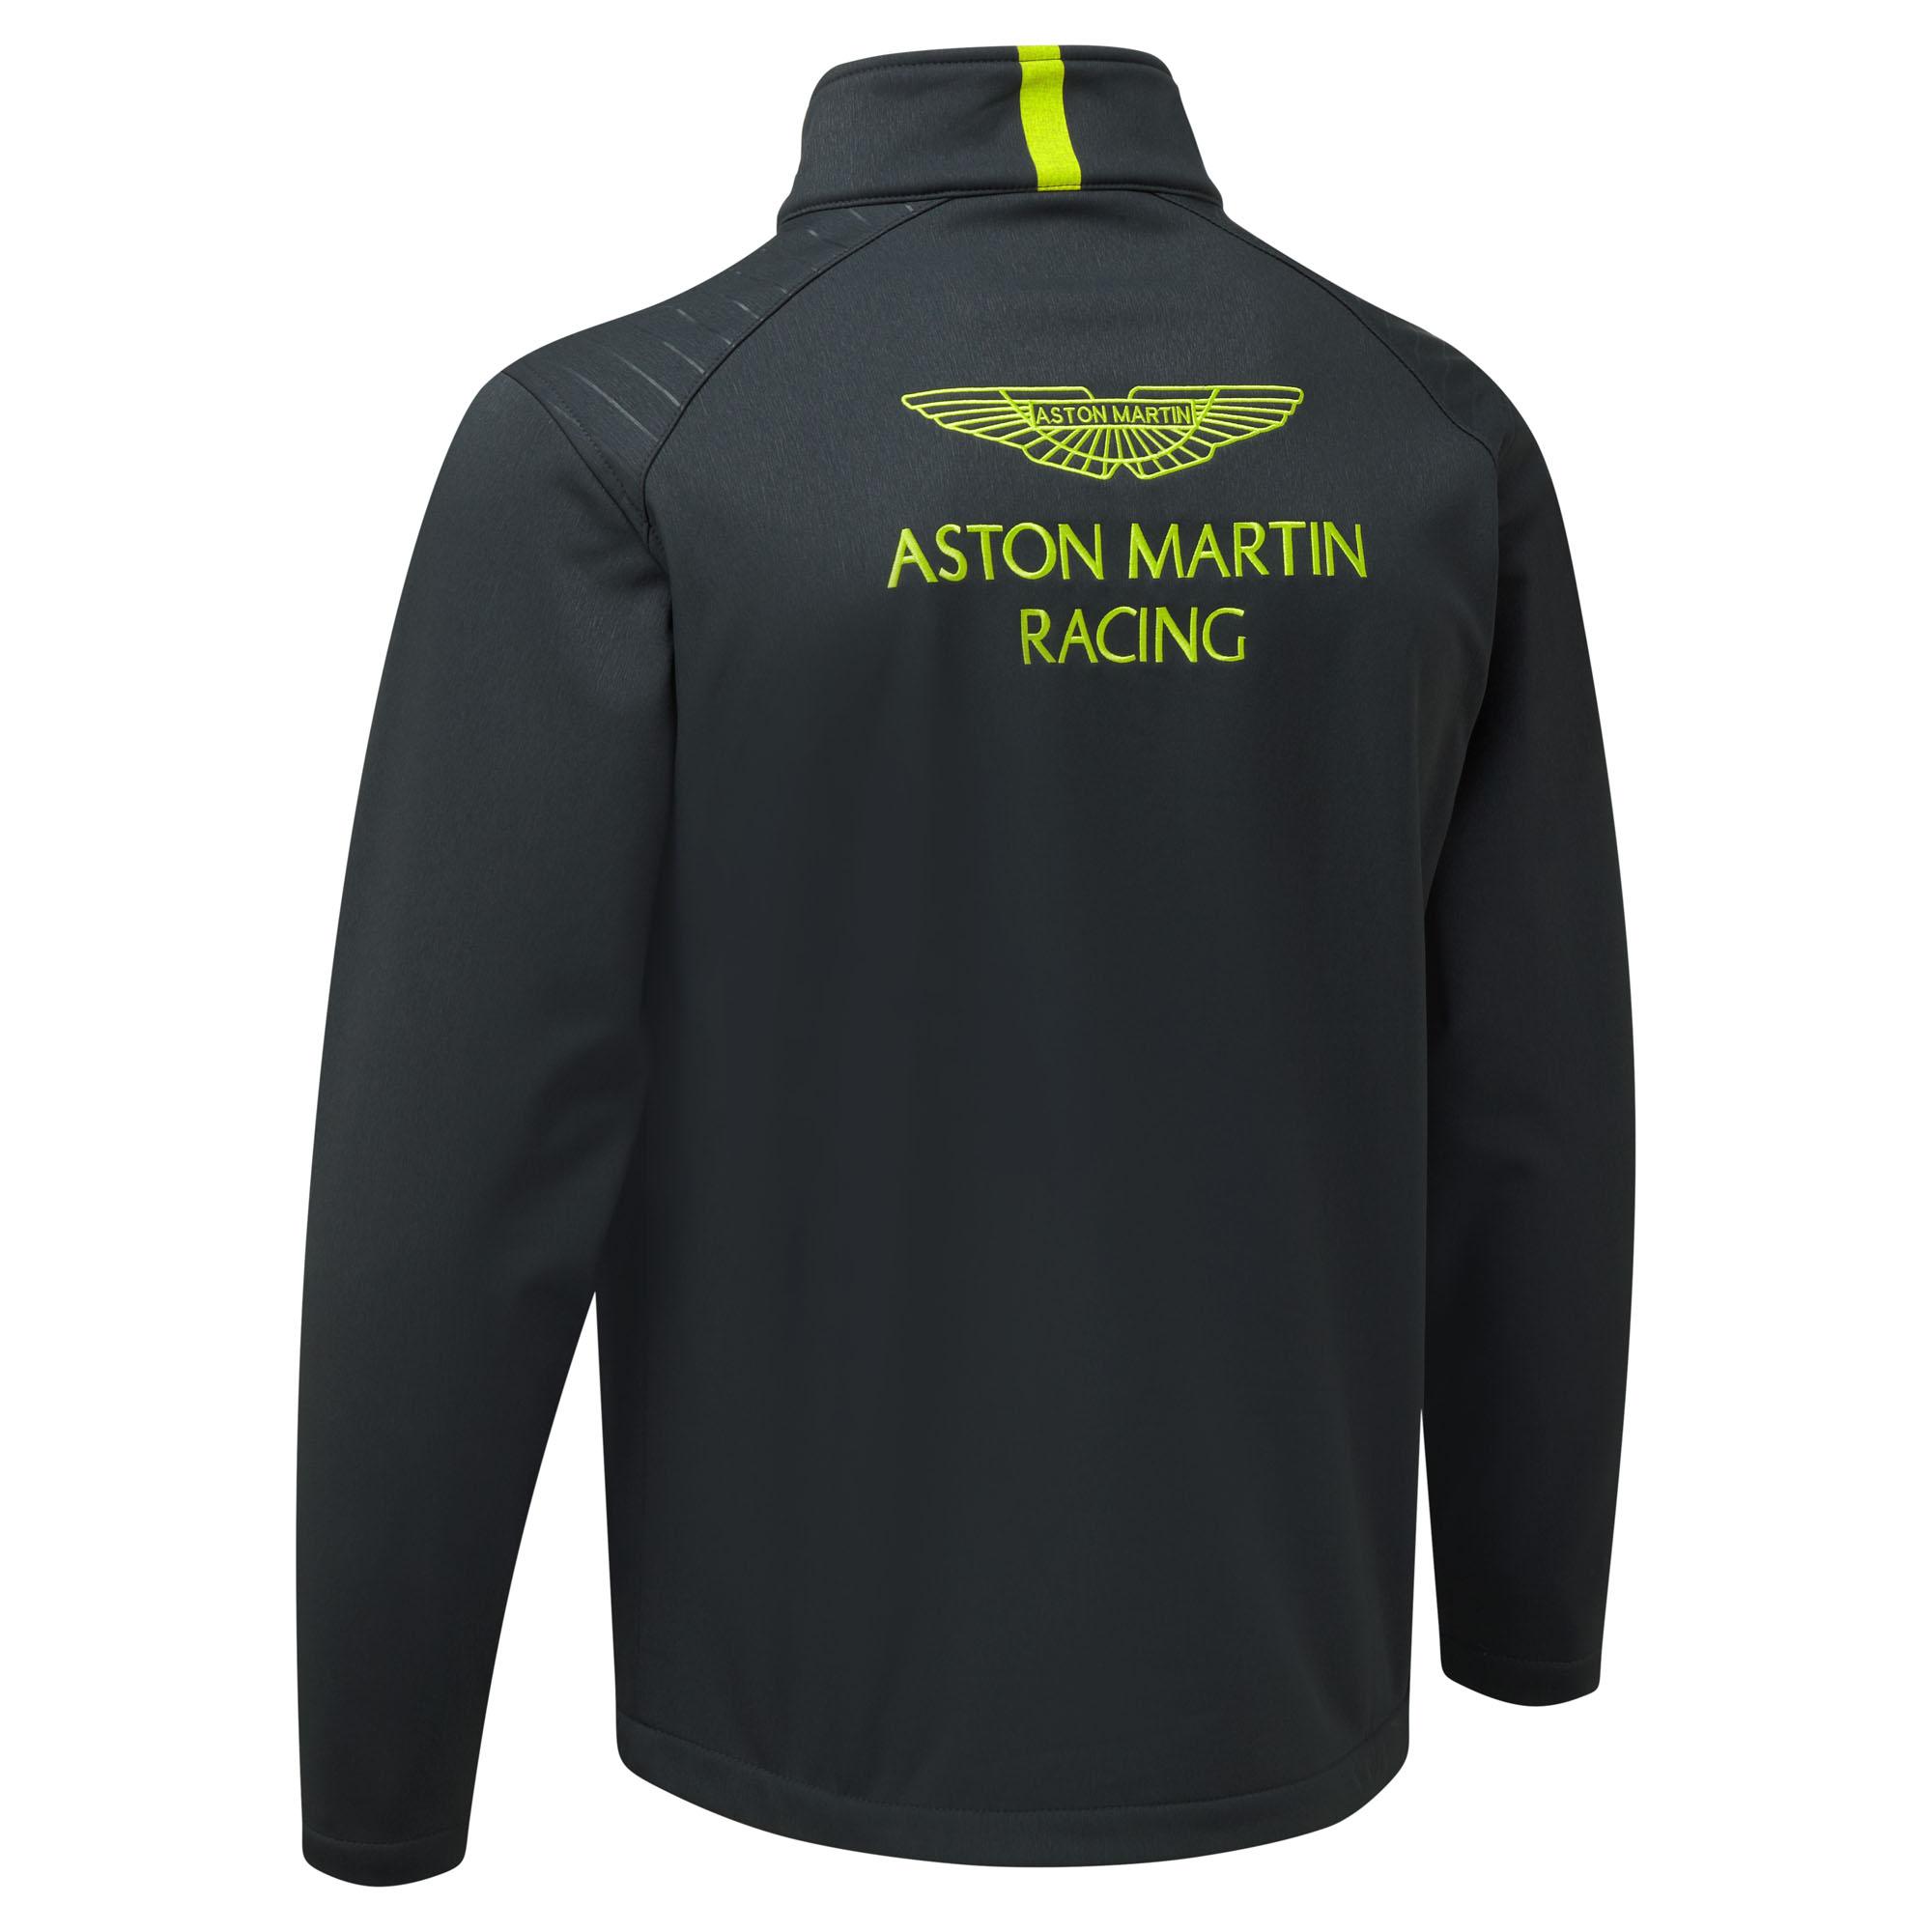 New Aston Martin Racing Team Mens Travel Softshell Jacket - Aston martin shirt